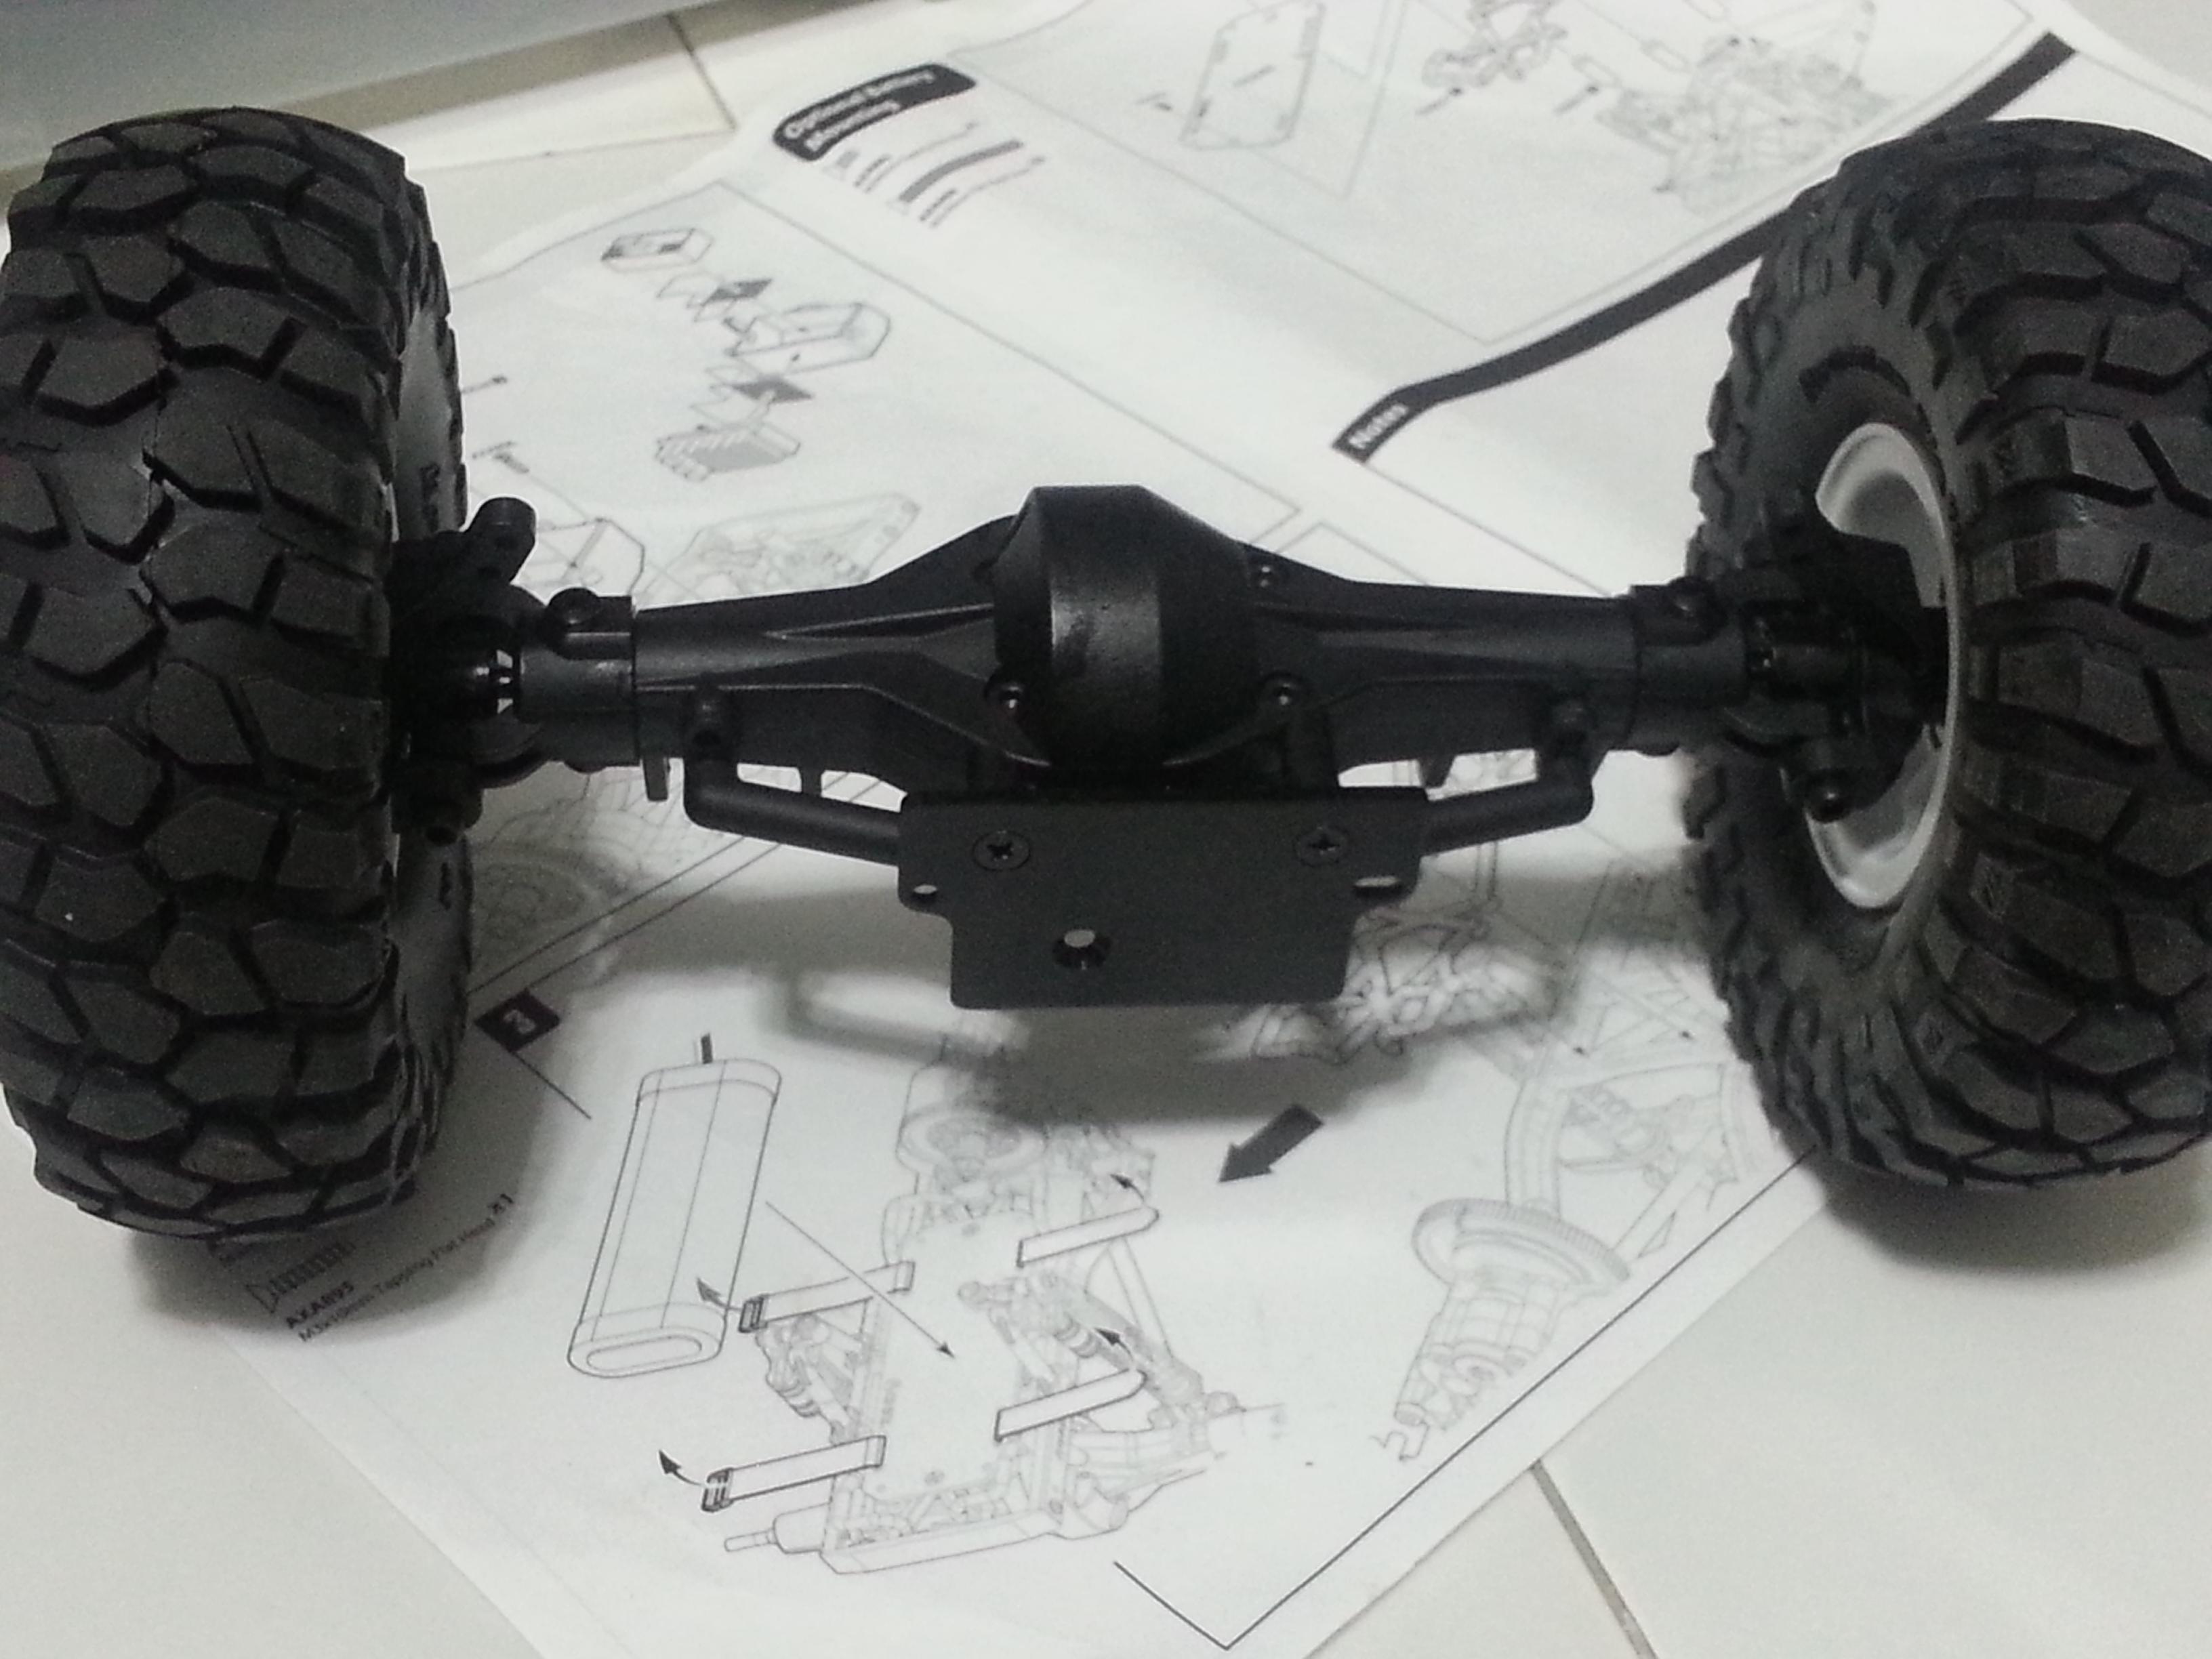 build - Babyboy's first 6x6 build 15589145497_ca78235527_o